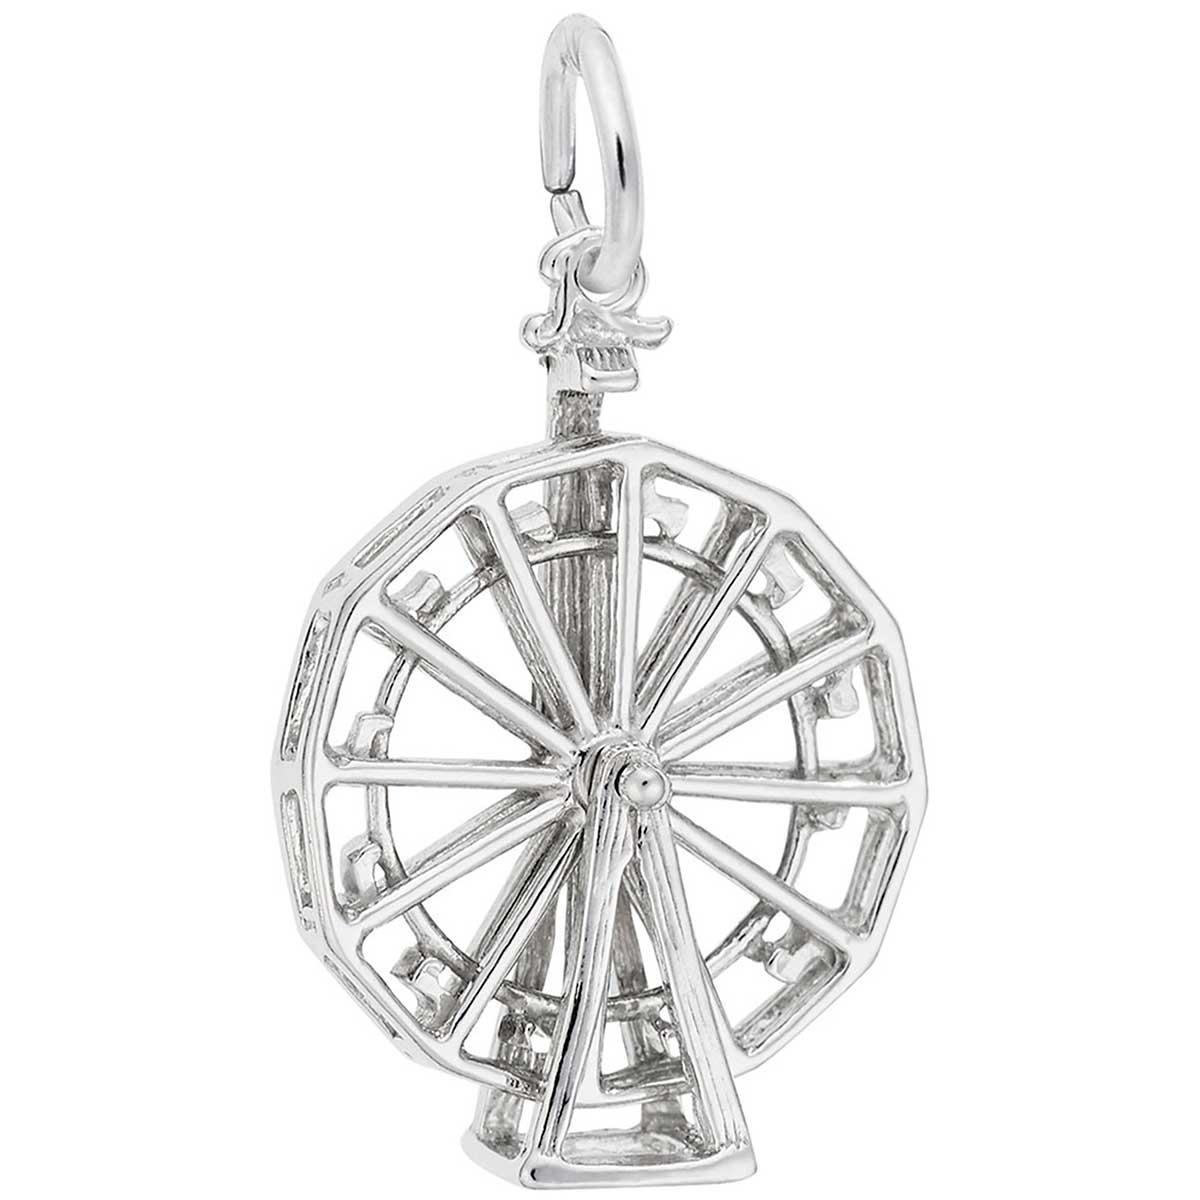 26fd886f6 Rembrandt Ferris Wheel Charm, Sterling Silver: Precious Accents, Ltd.